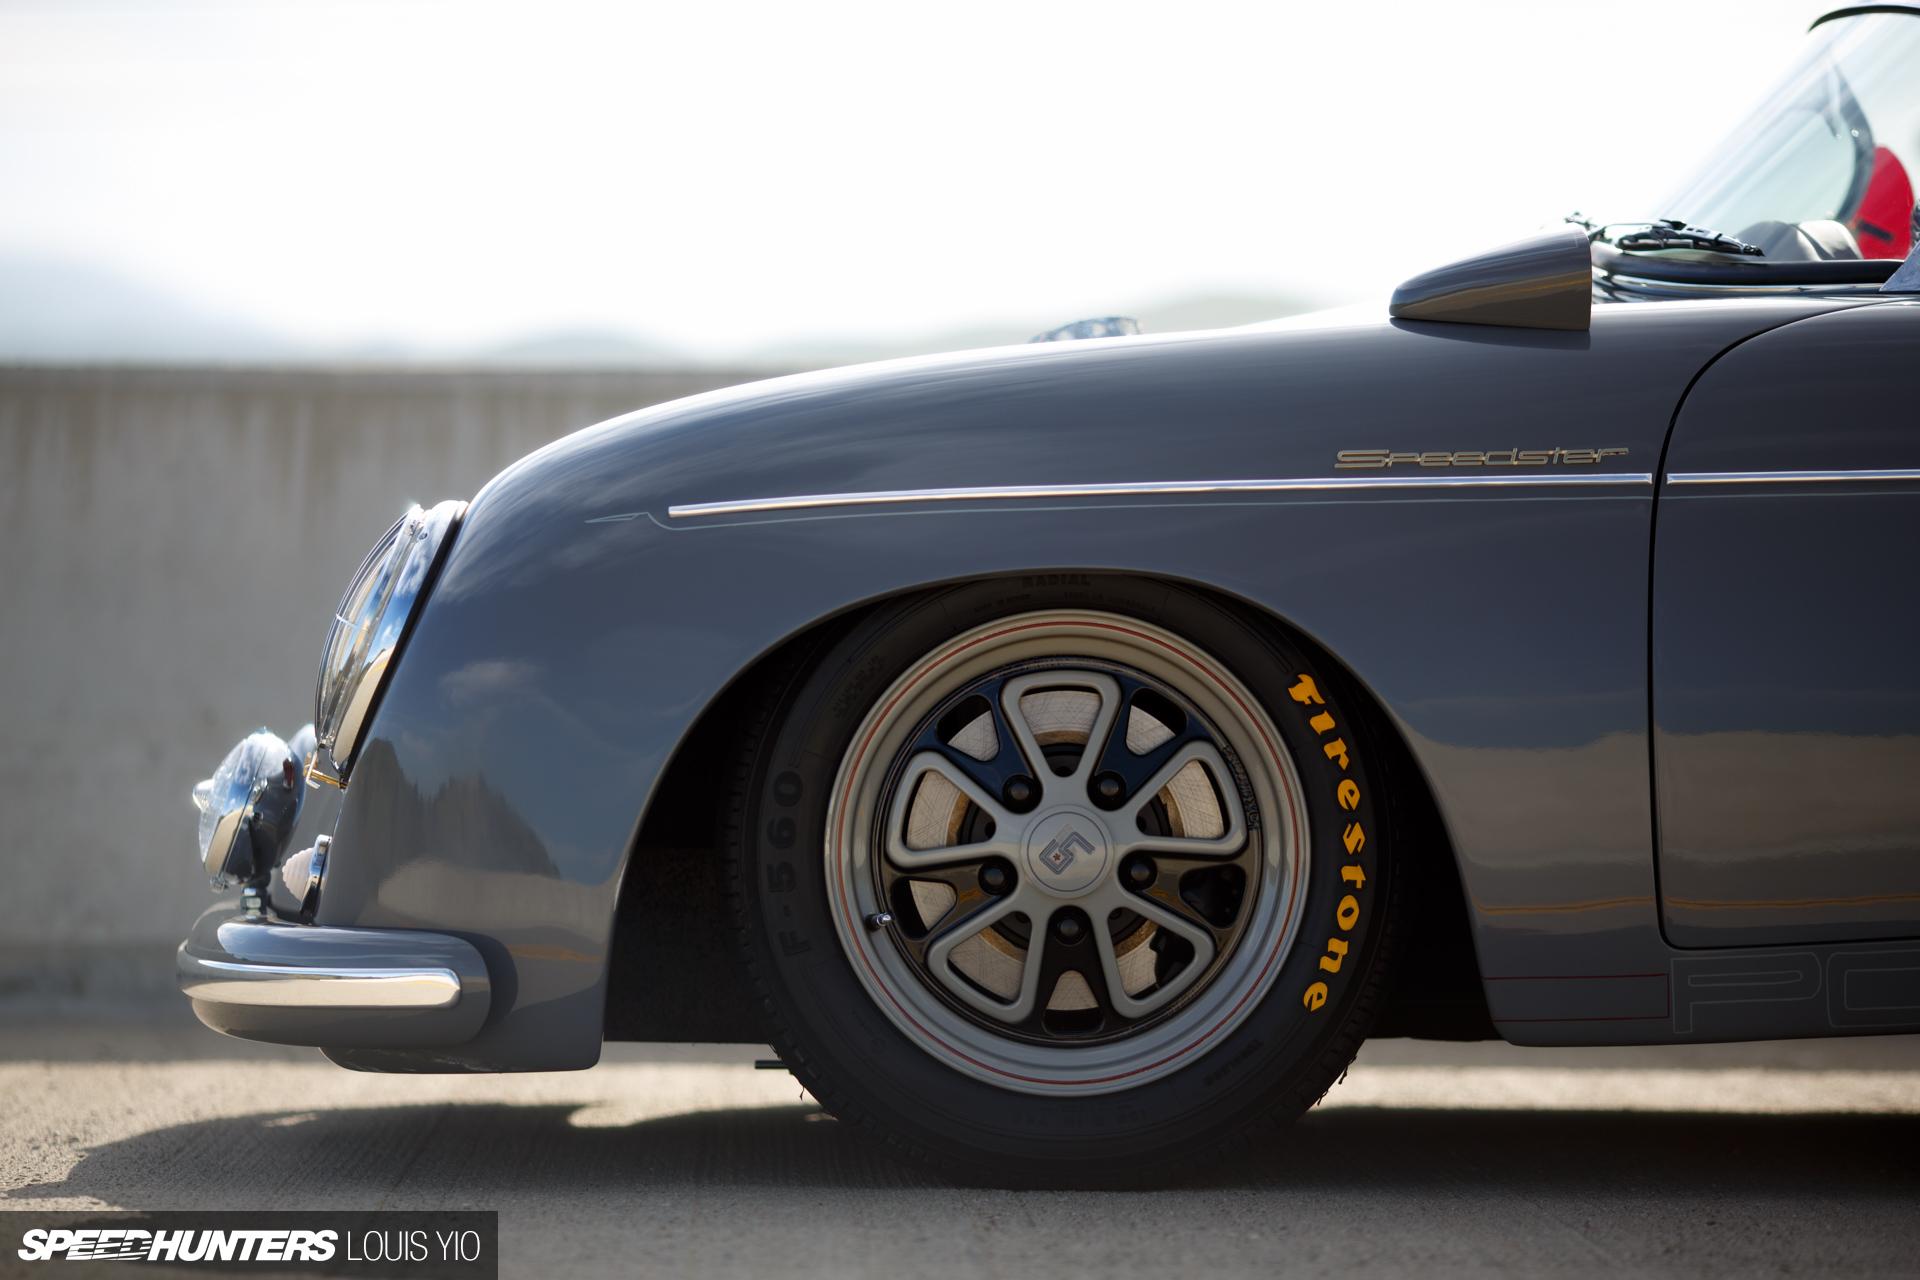 Firestone Car Tires